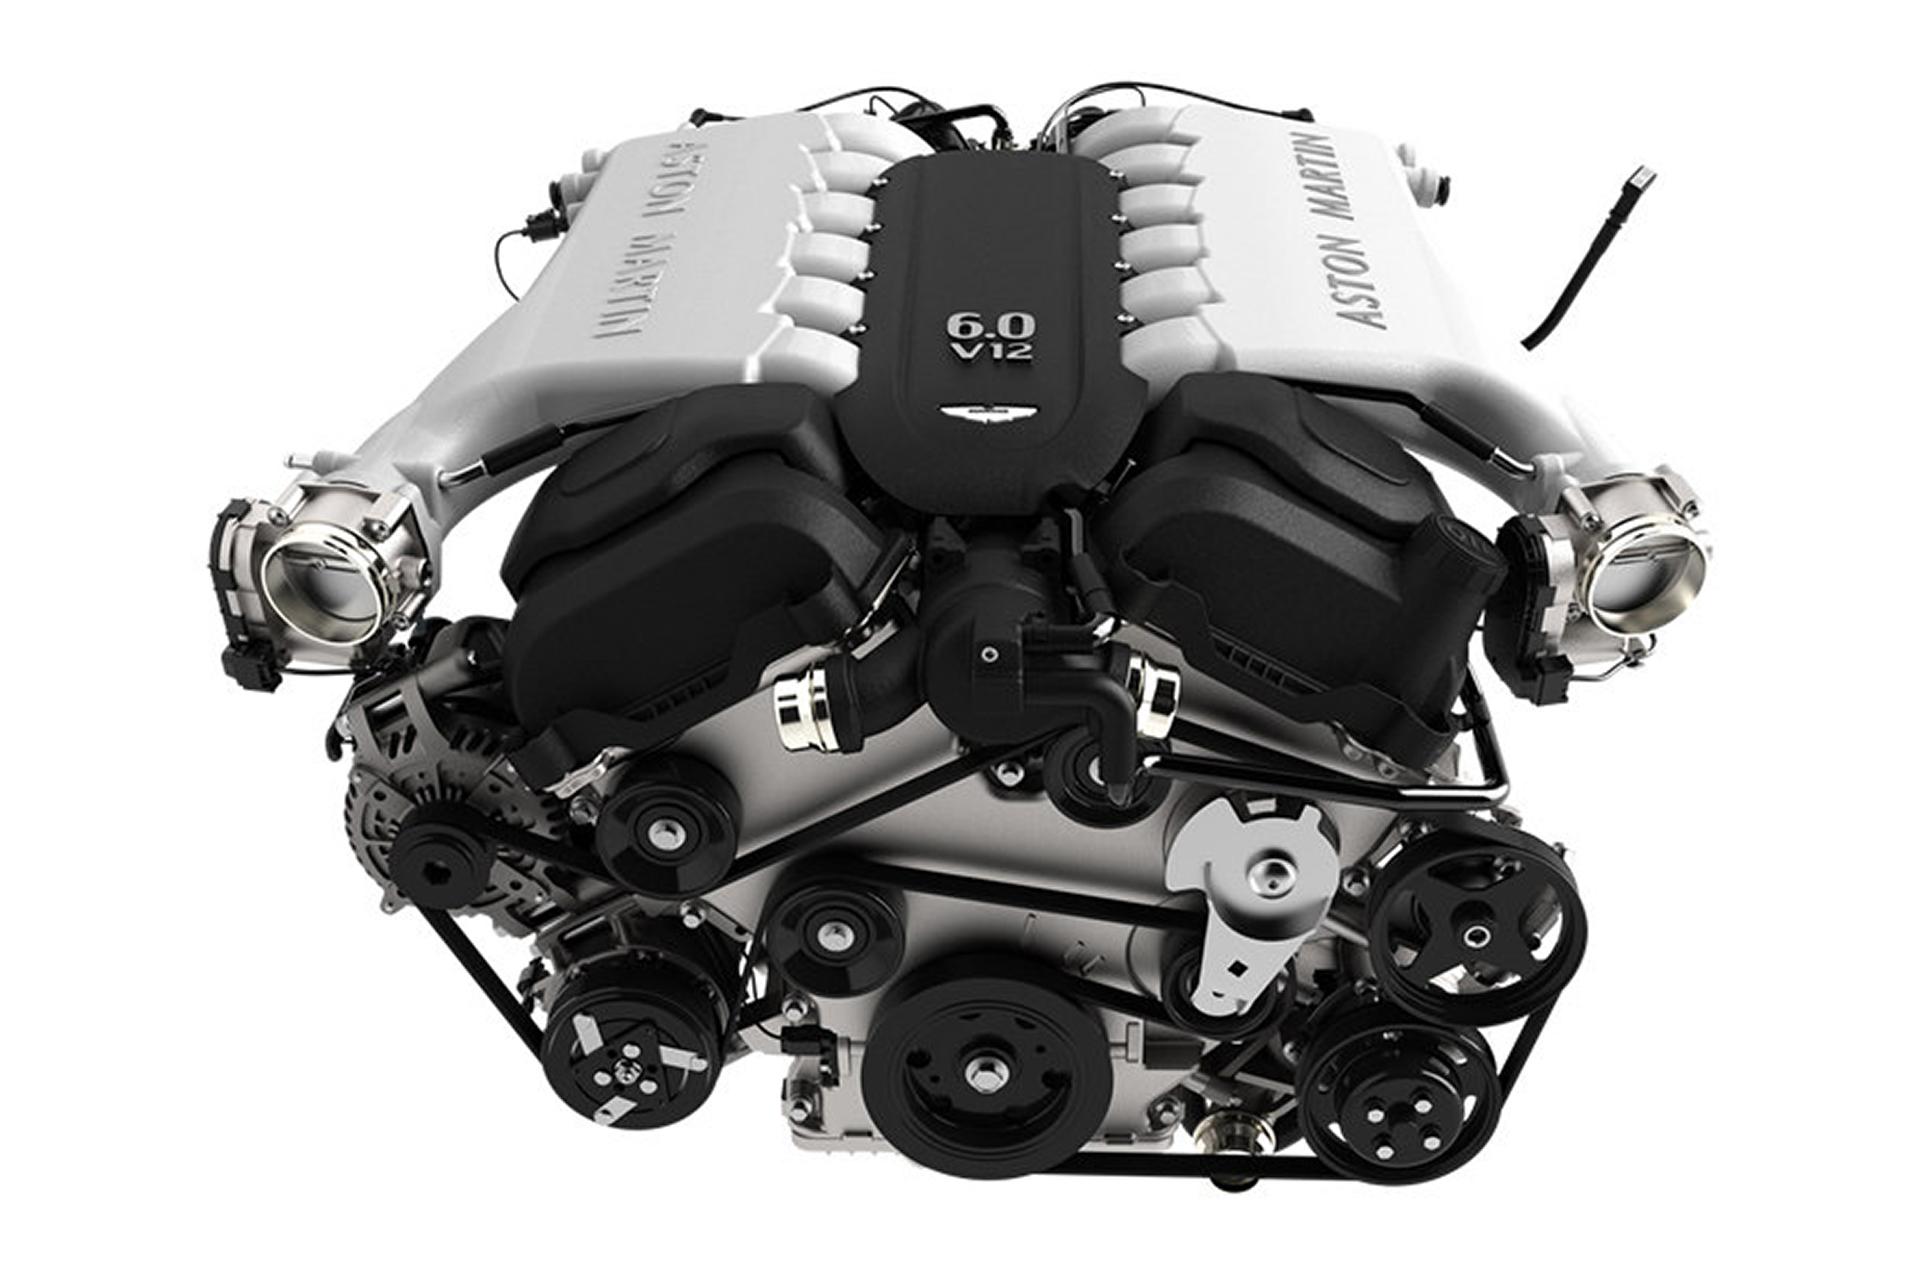 Aston Martin DB9 - V12 - moteur / engine